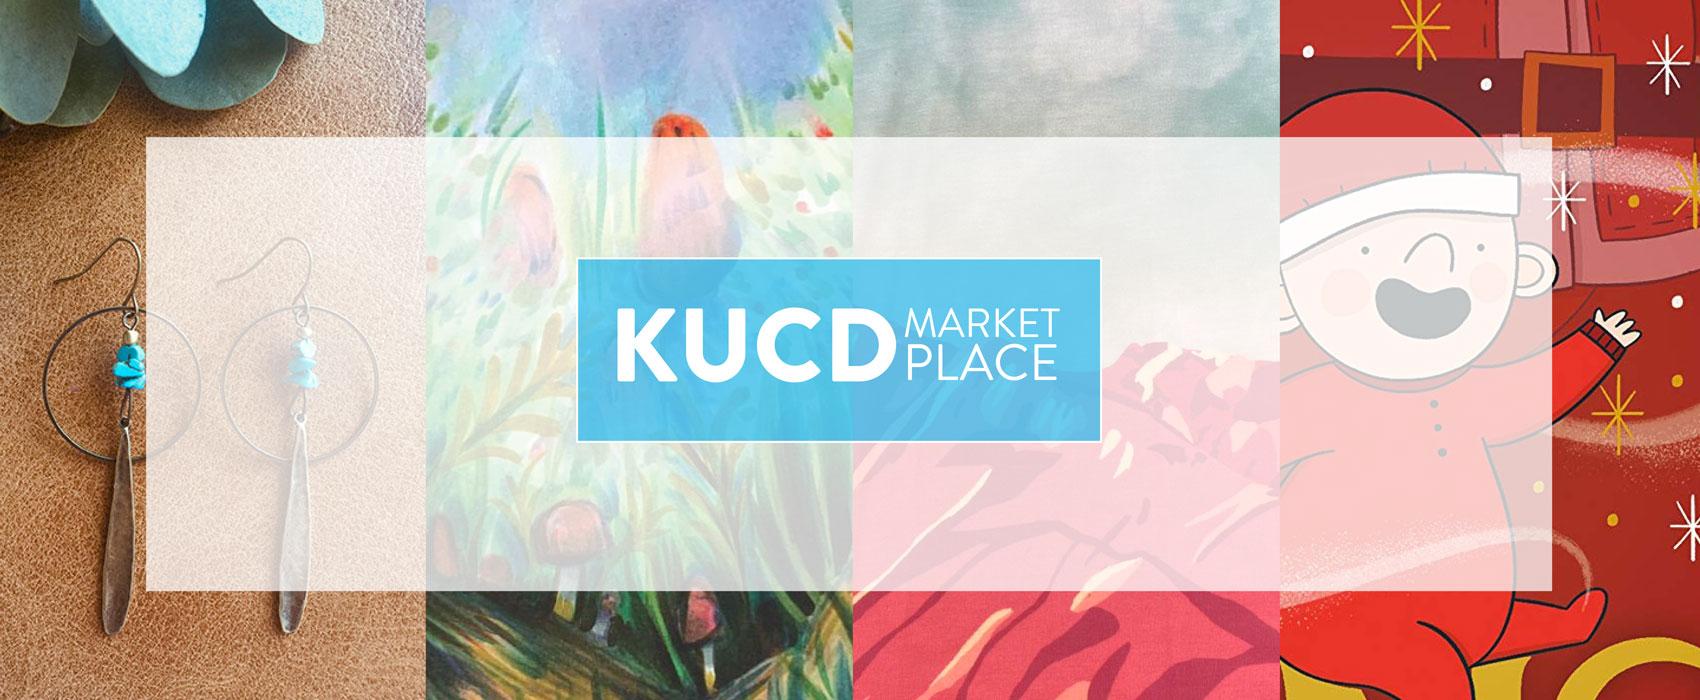 kucd-marketplace